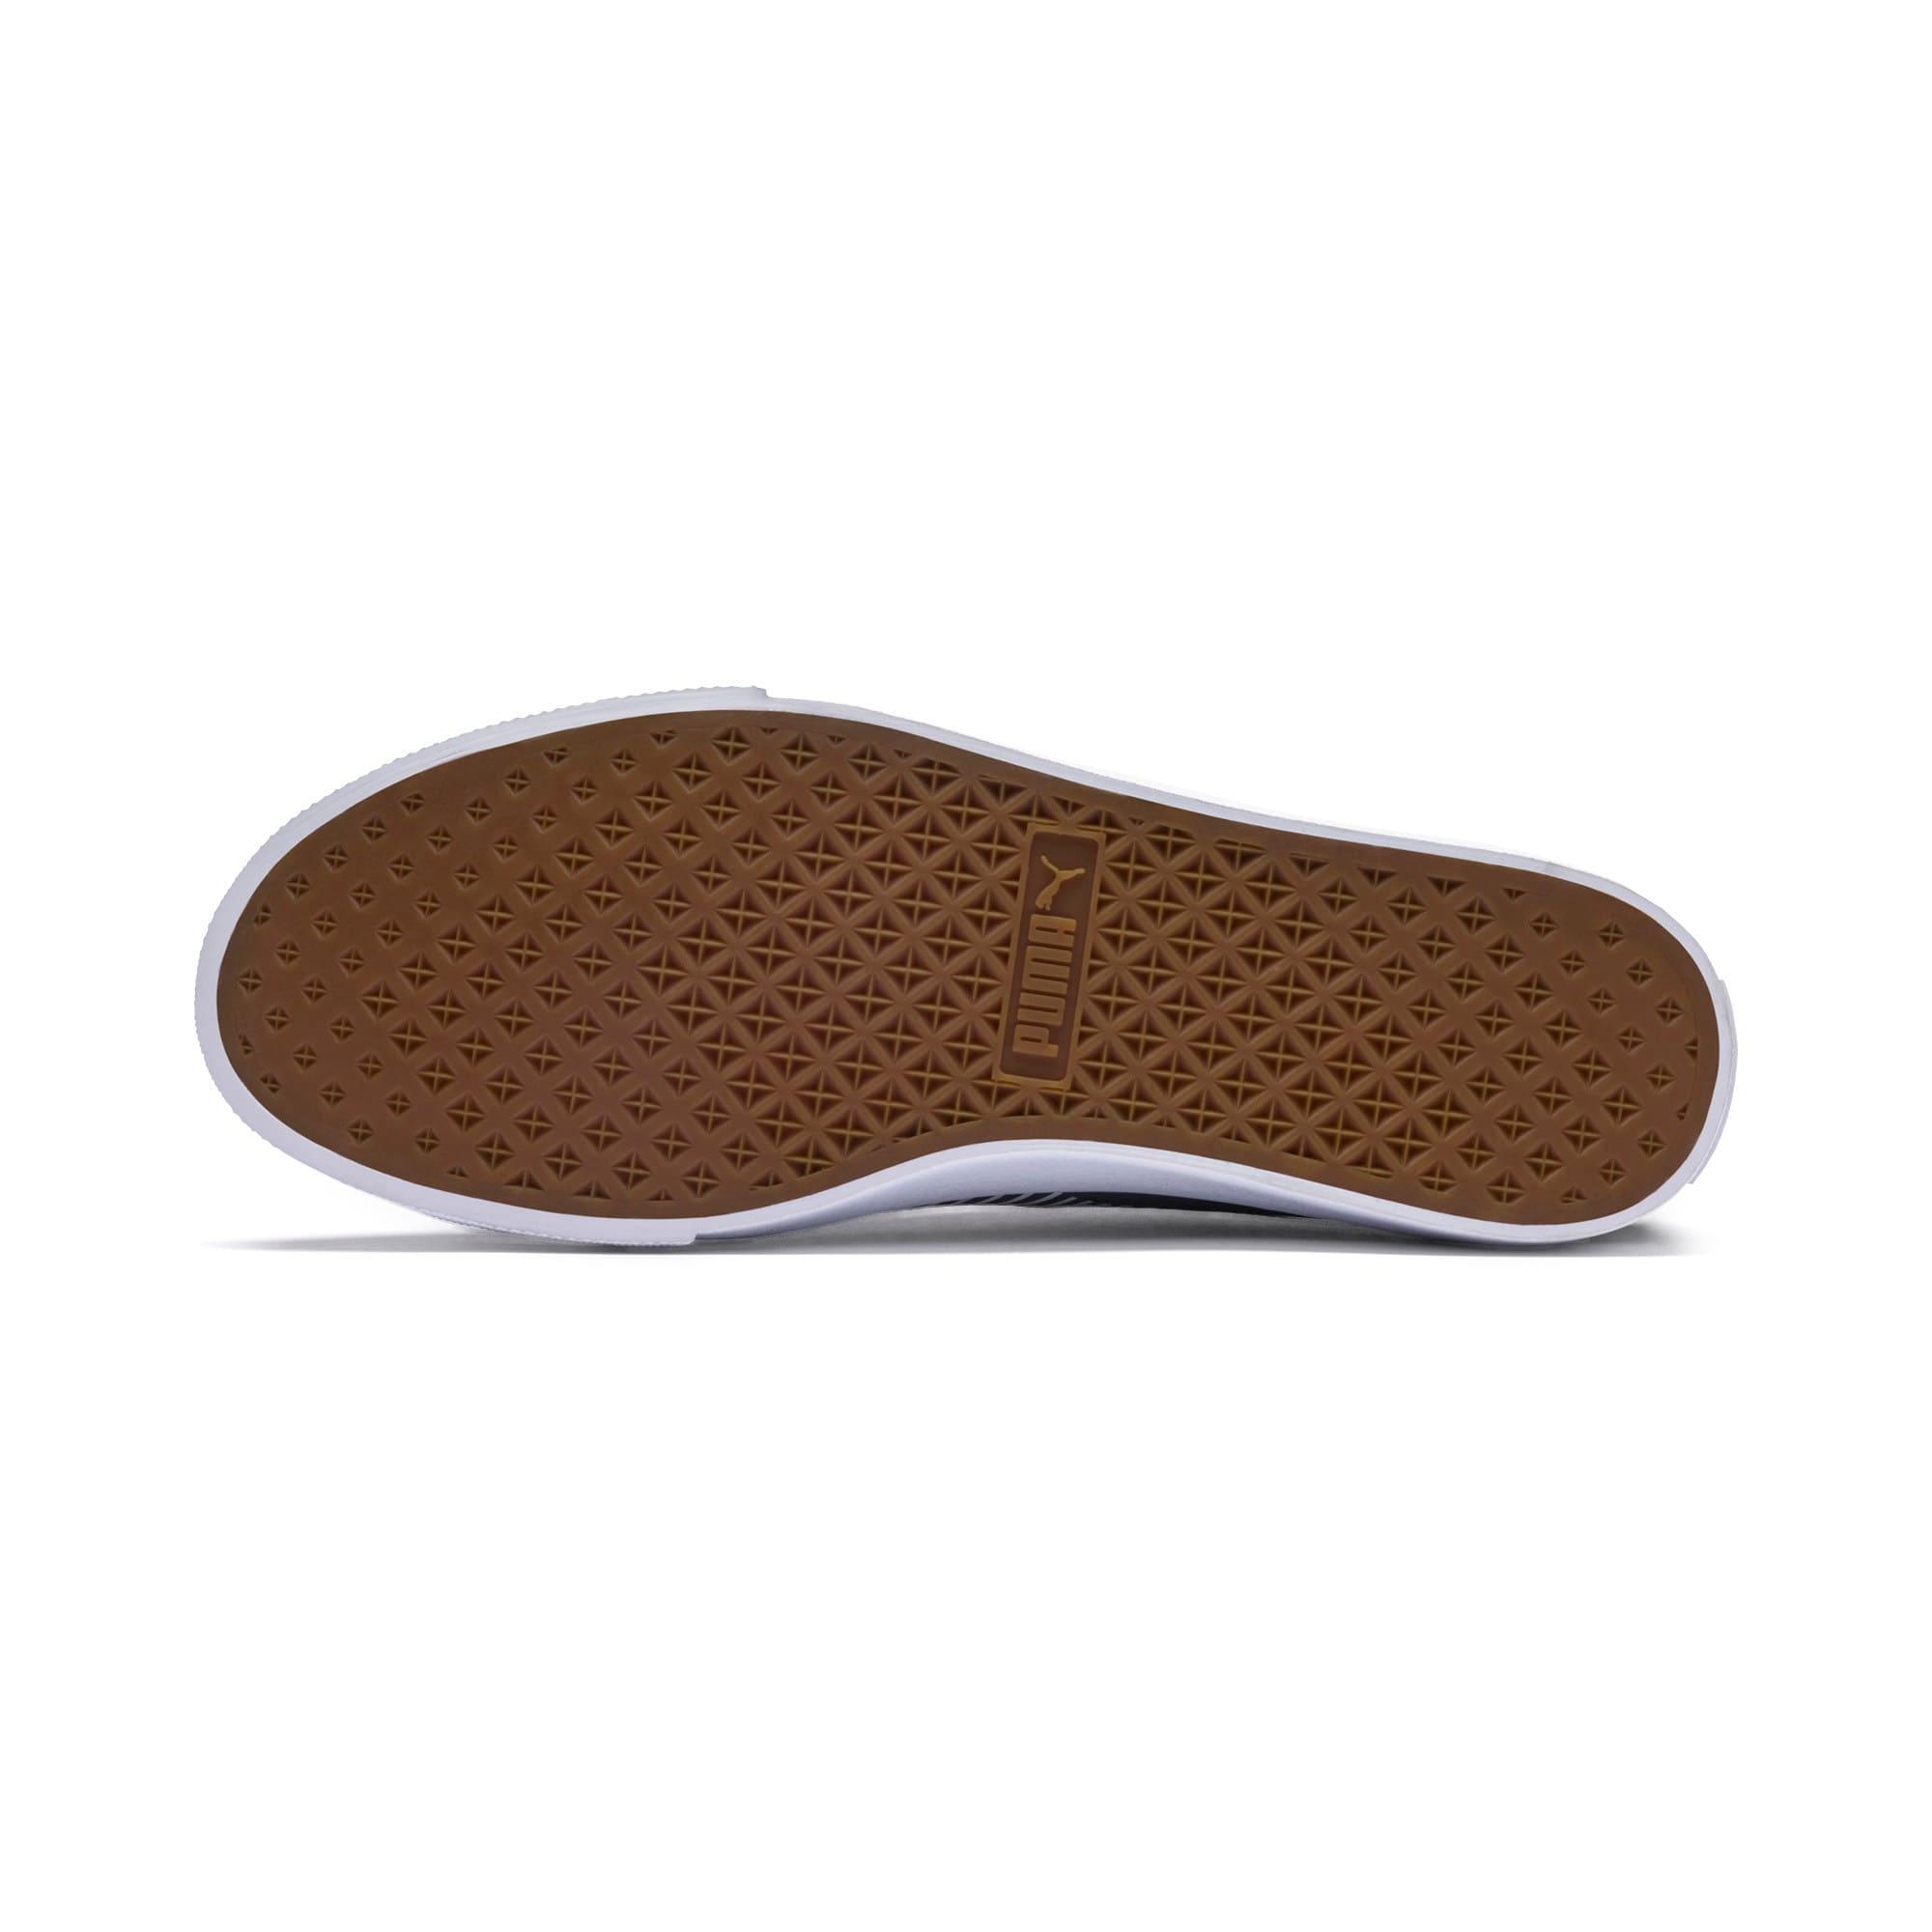 Thumbnail 3 of Bari Sneakers, Charcoal Gray-Puma White, medium